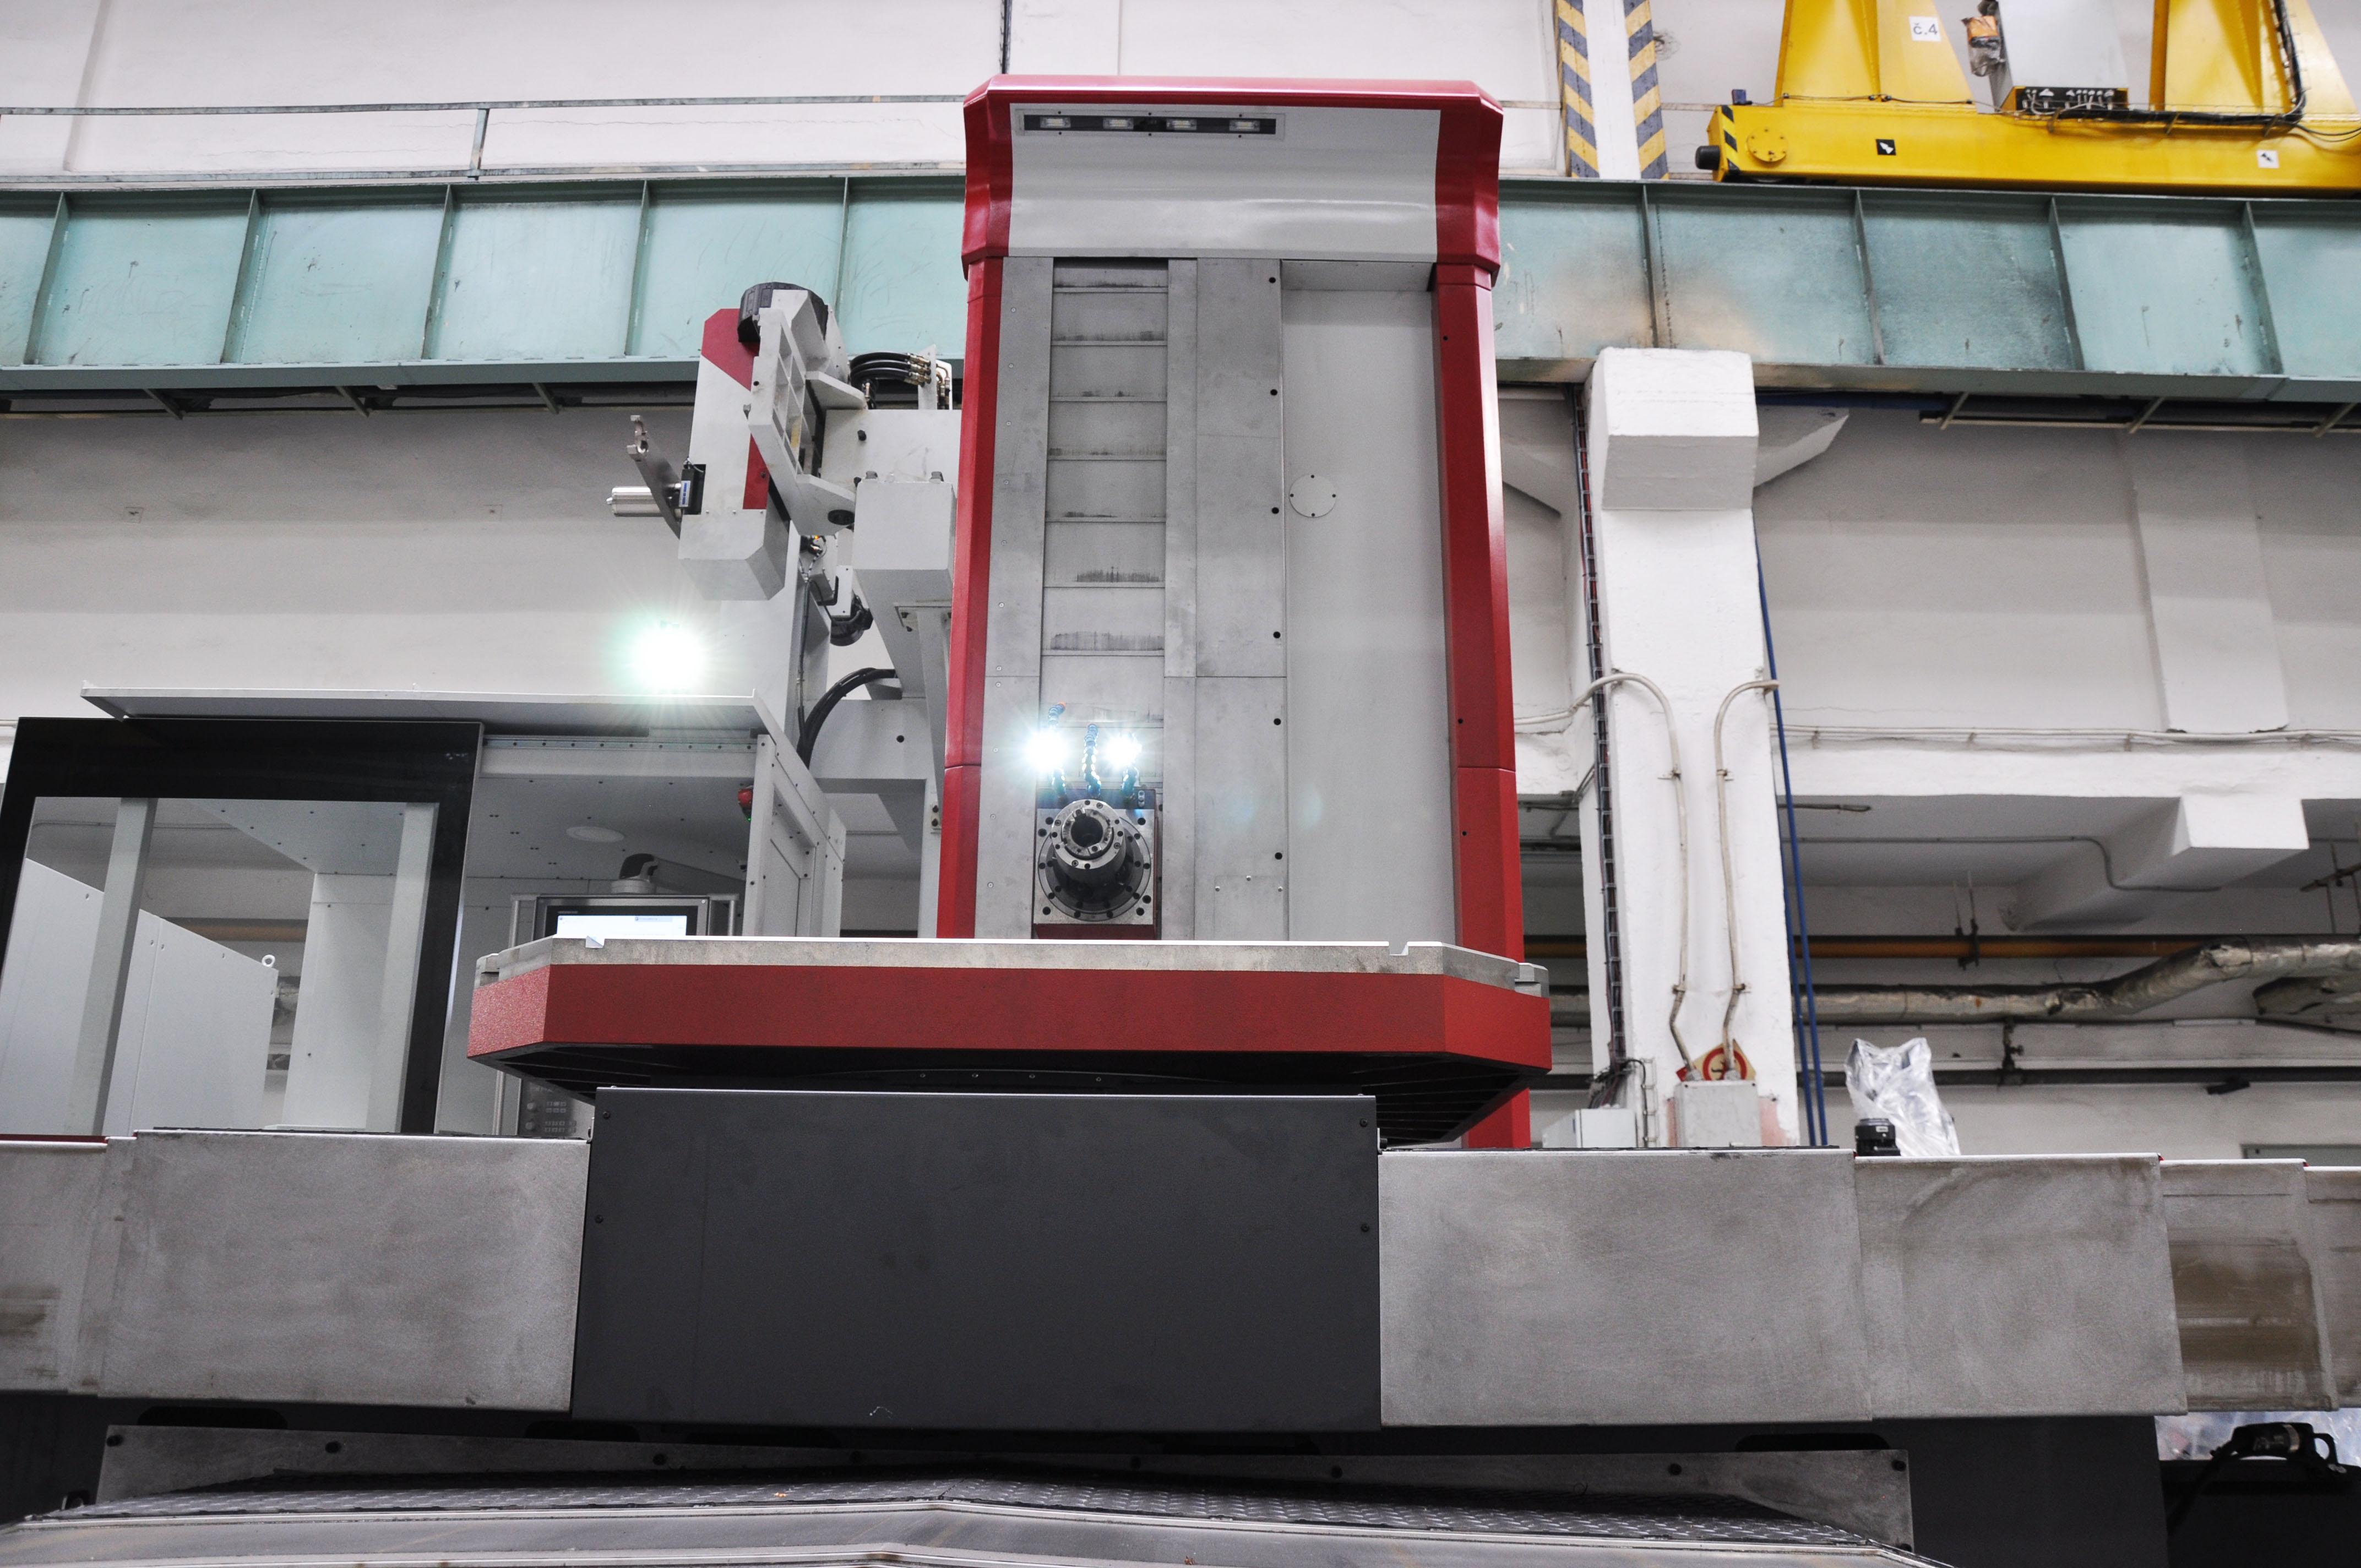 WXC 100 - horizontal table-type boring mill - Image4